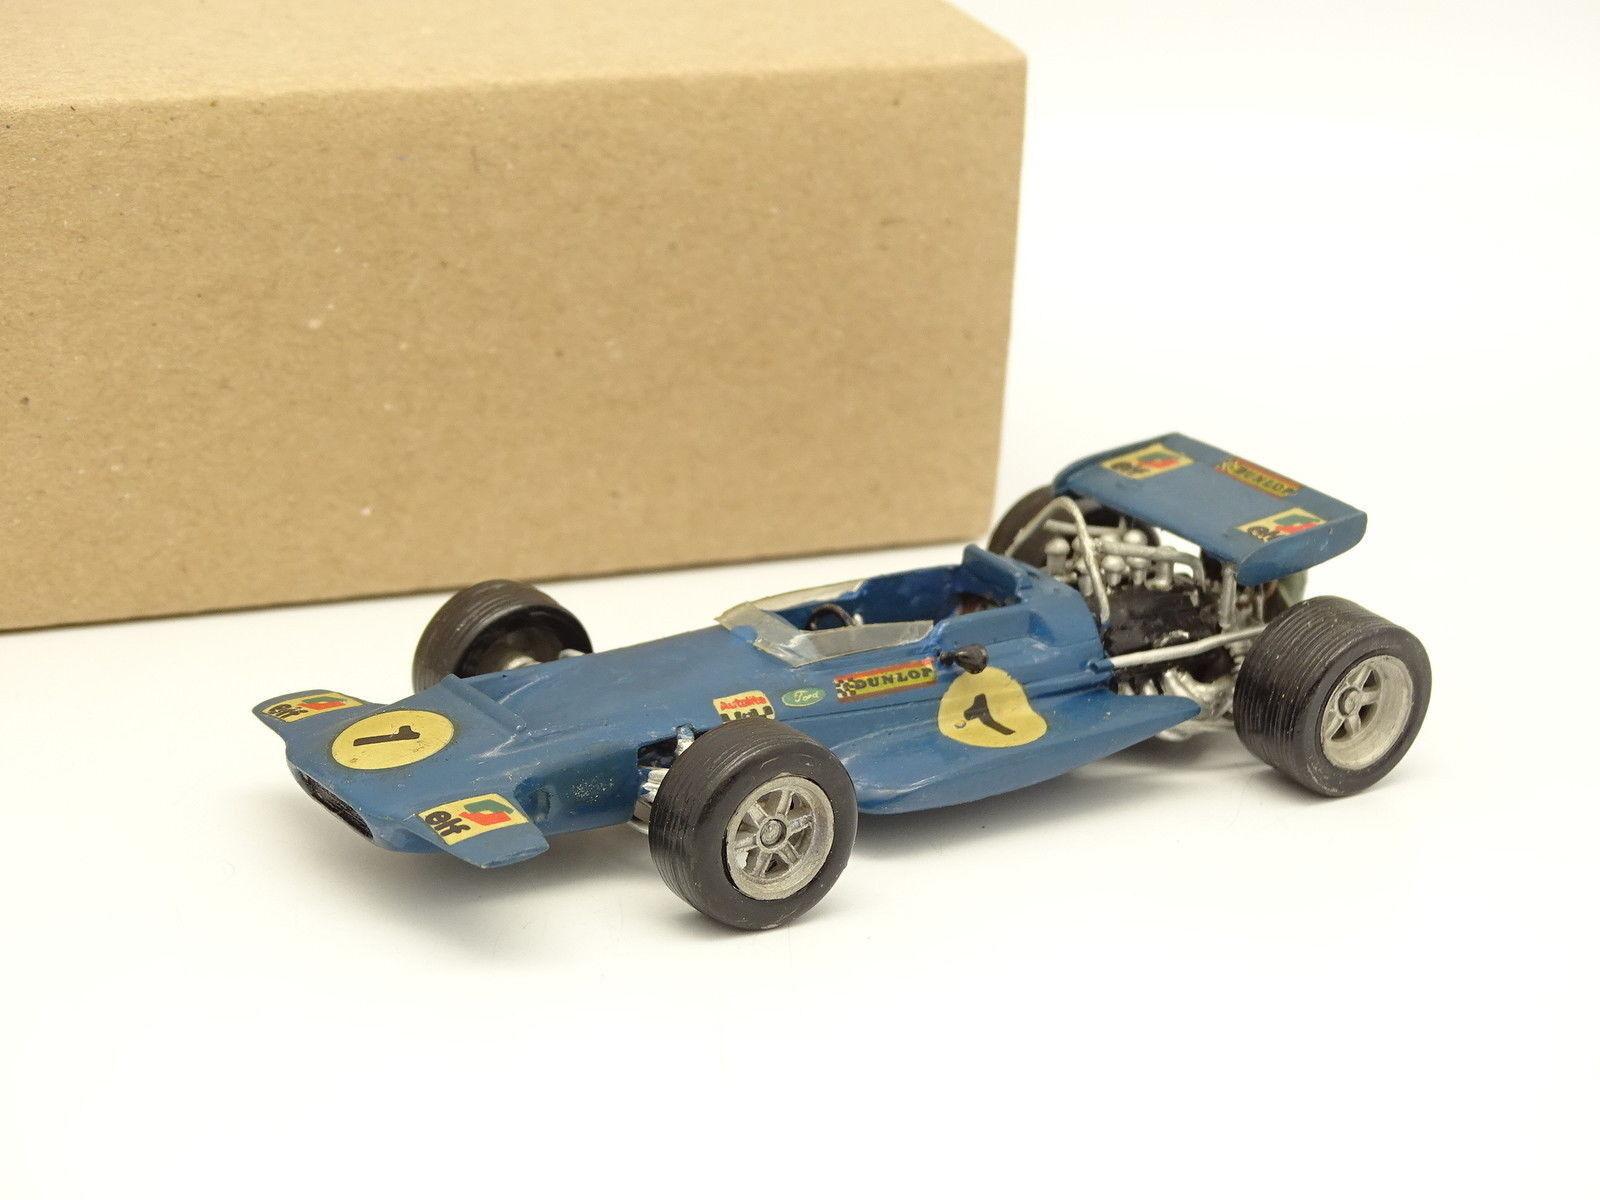 Kit Metal Montado 1 43 - F1 Tyrrell Ford 001 Stewart